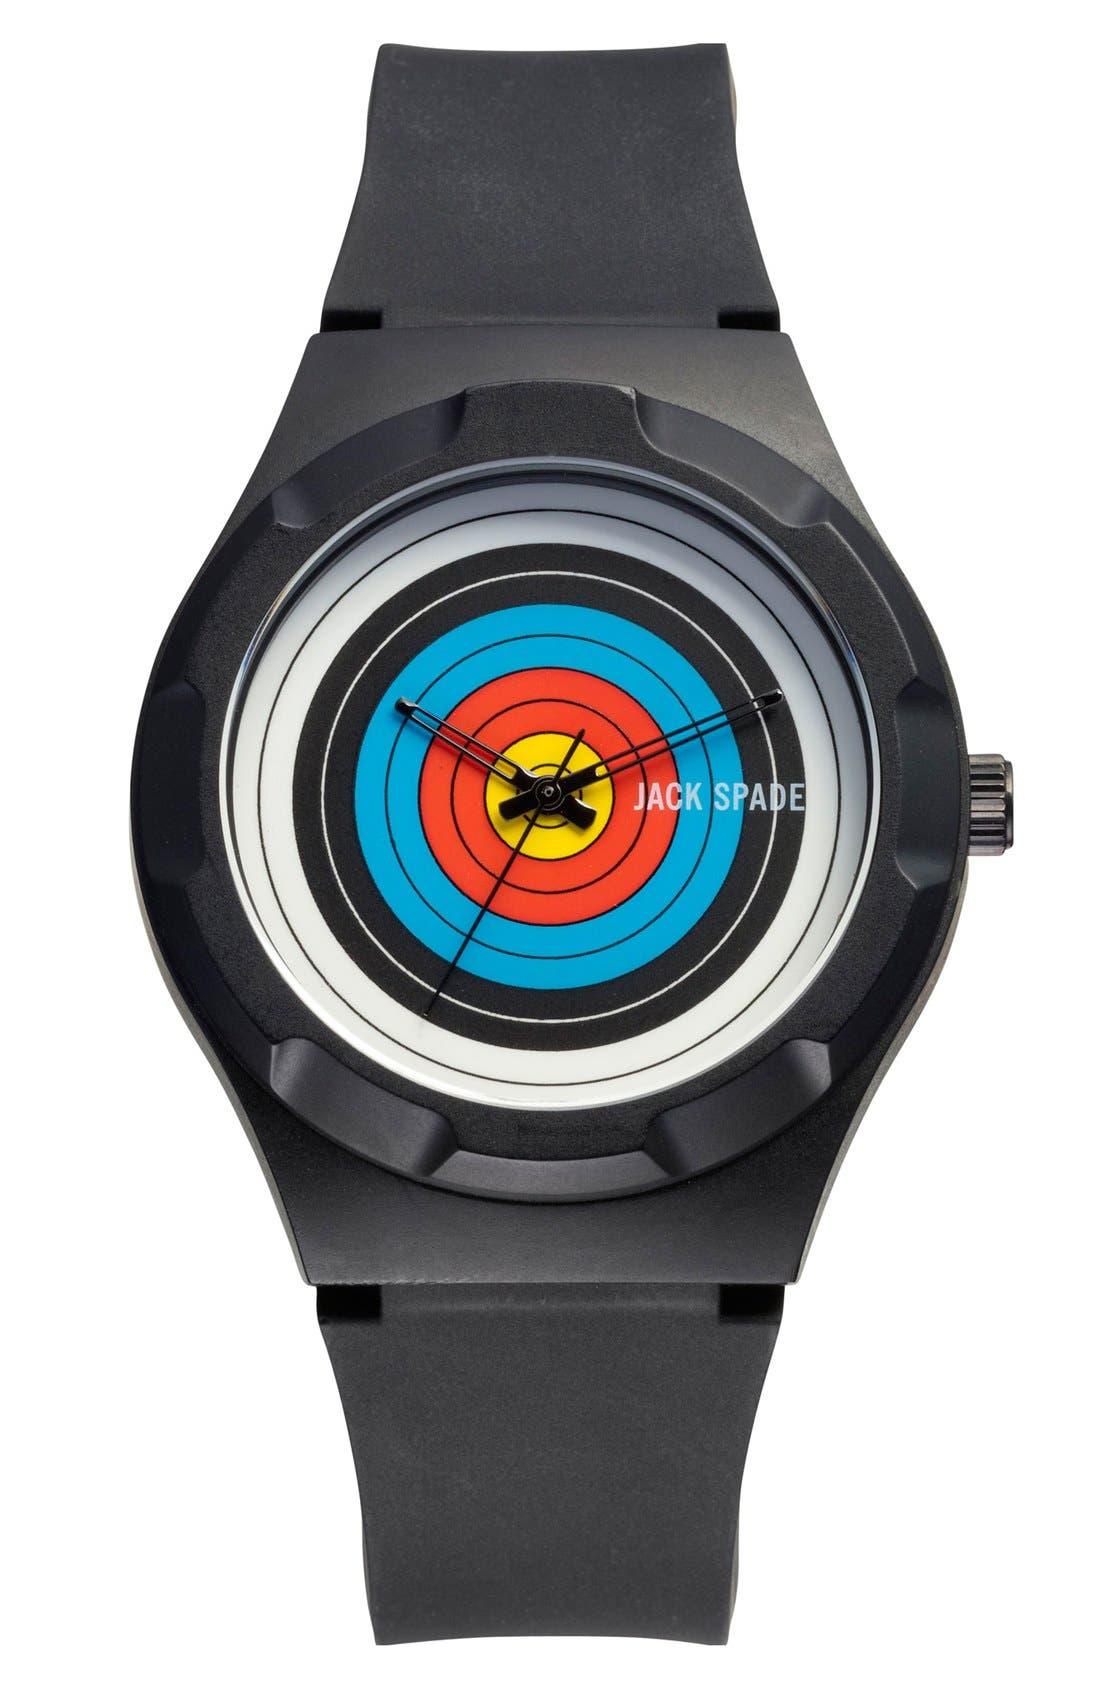 Main Image - Jack Spade 'Graphic - Archery' Round Watch, 38mm